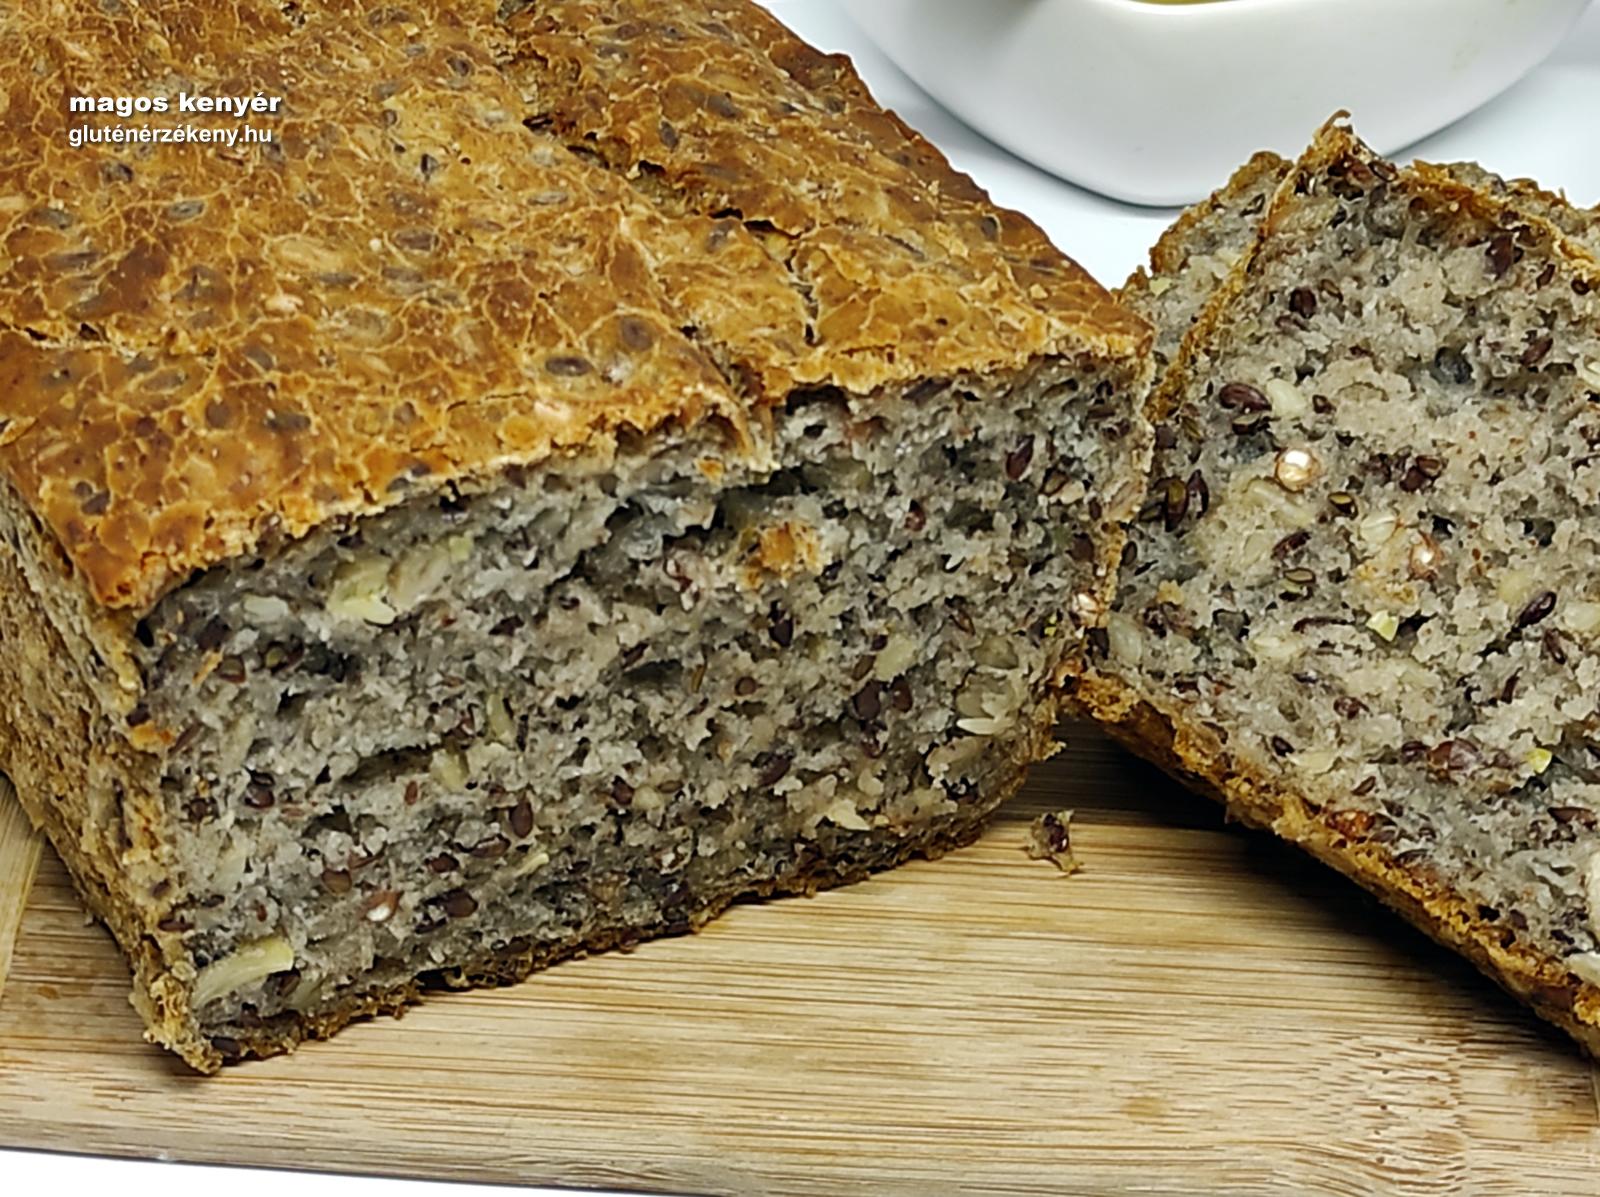 magos gluténmentes kenyér recept